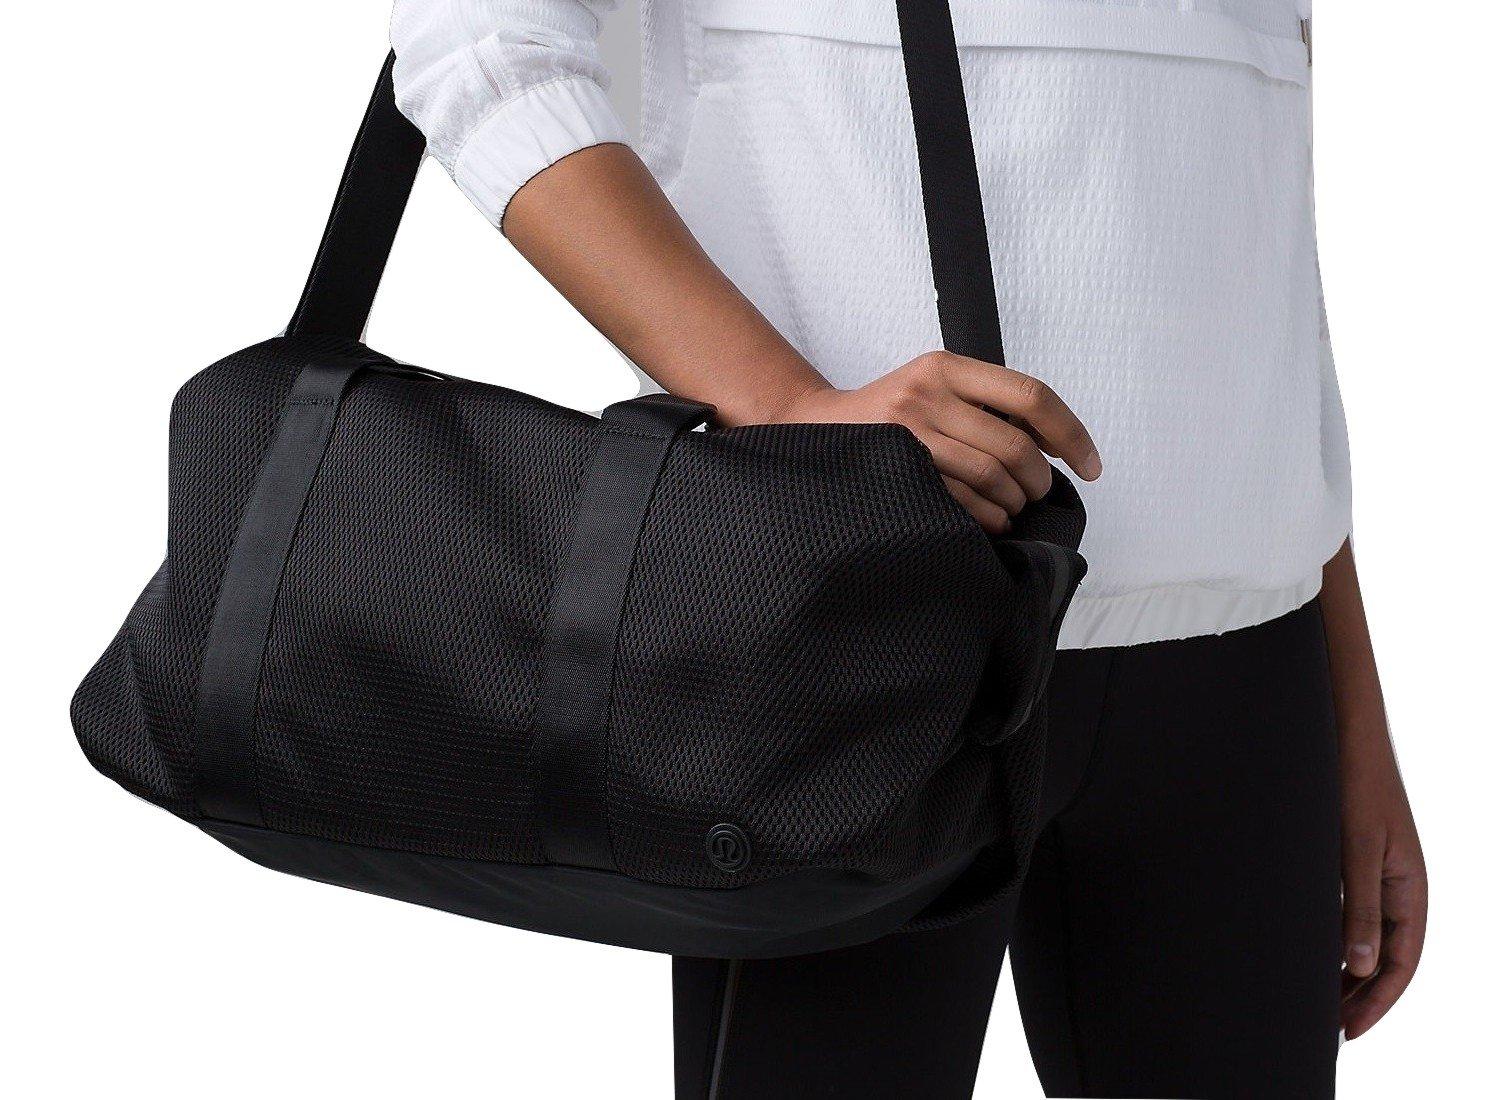 Lululemon Fast Track Duffel Bag (Mesh Black) by Lululemon